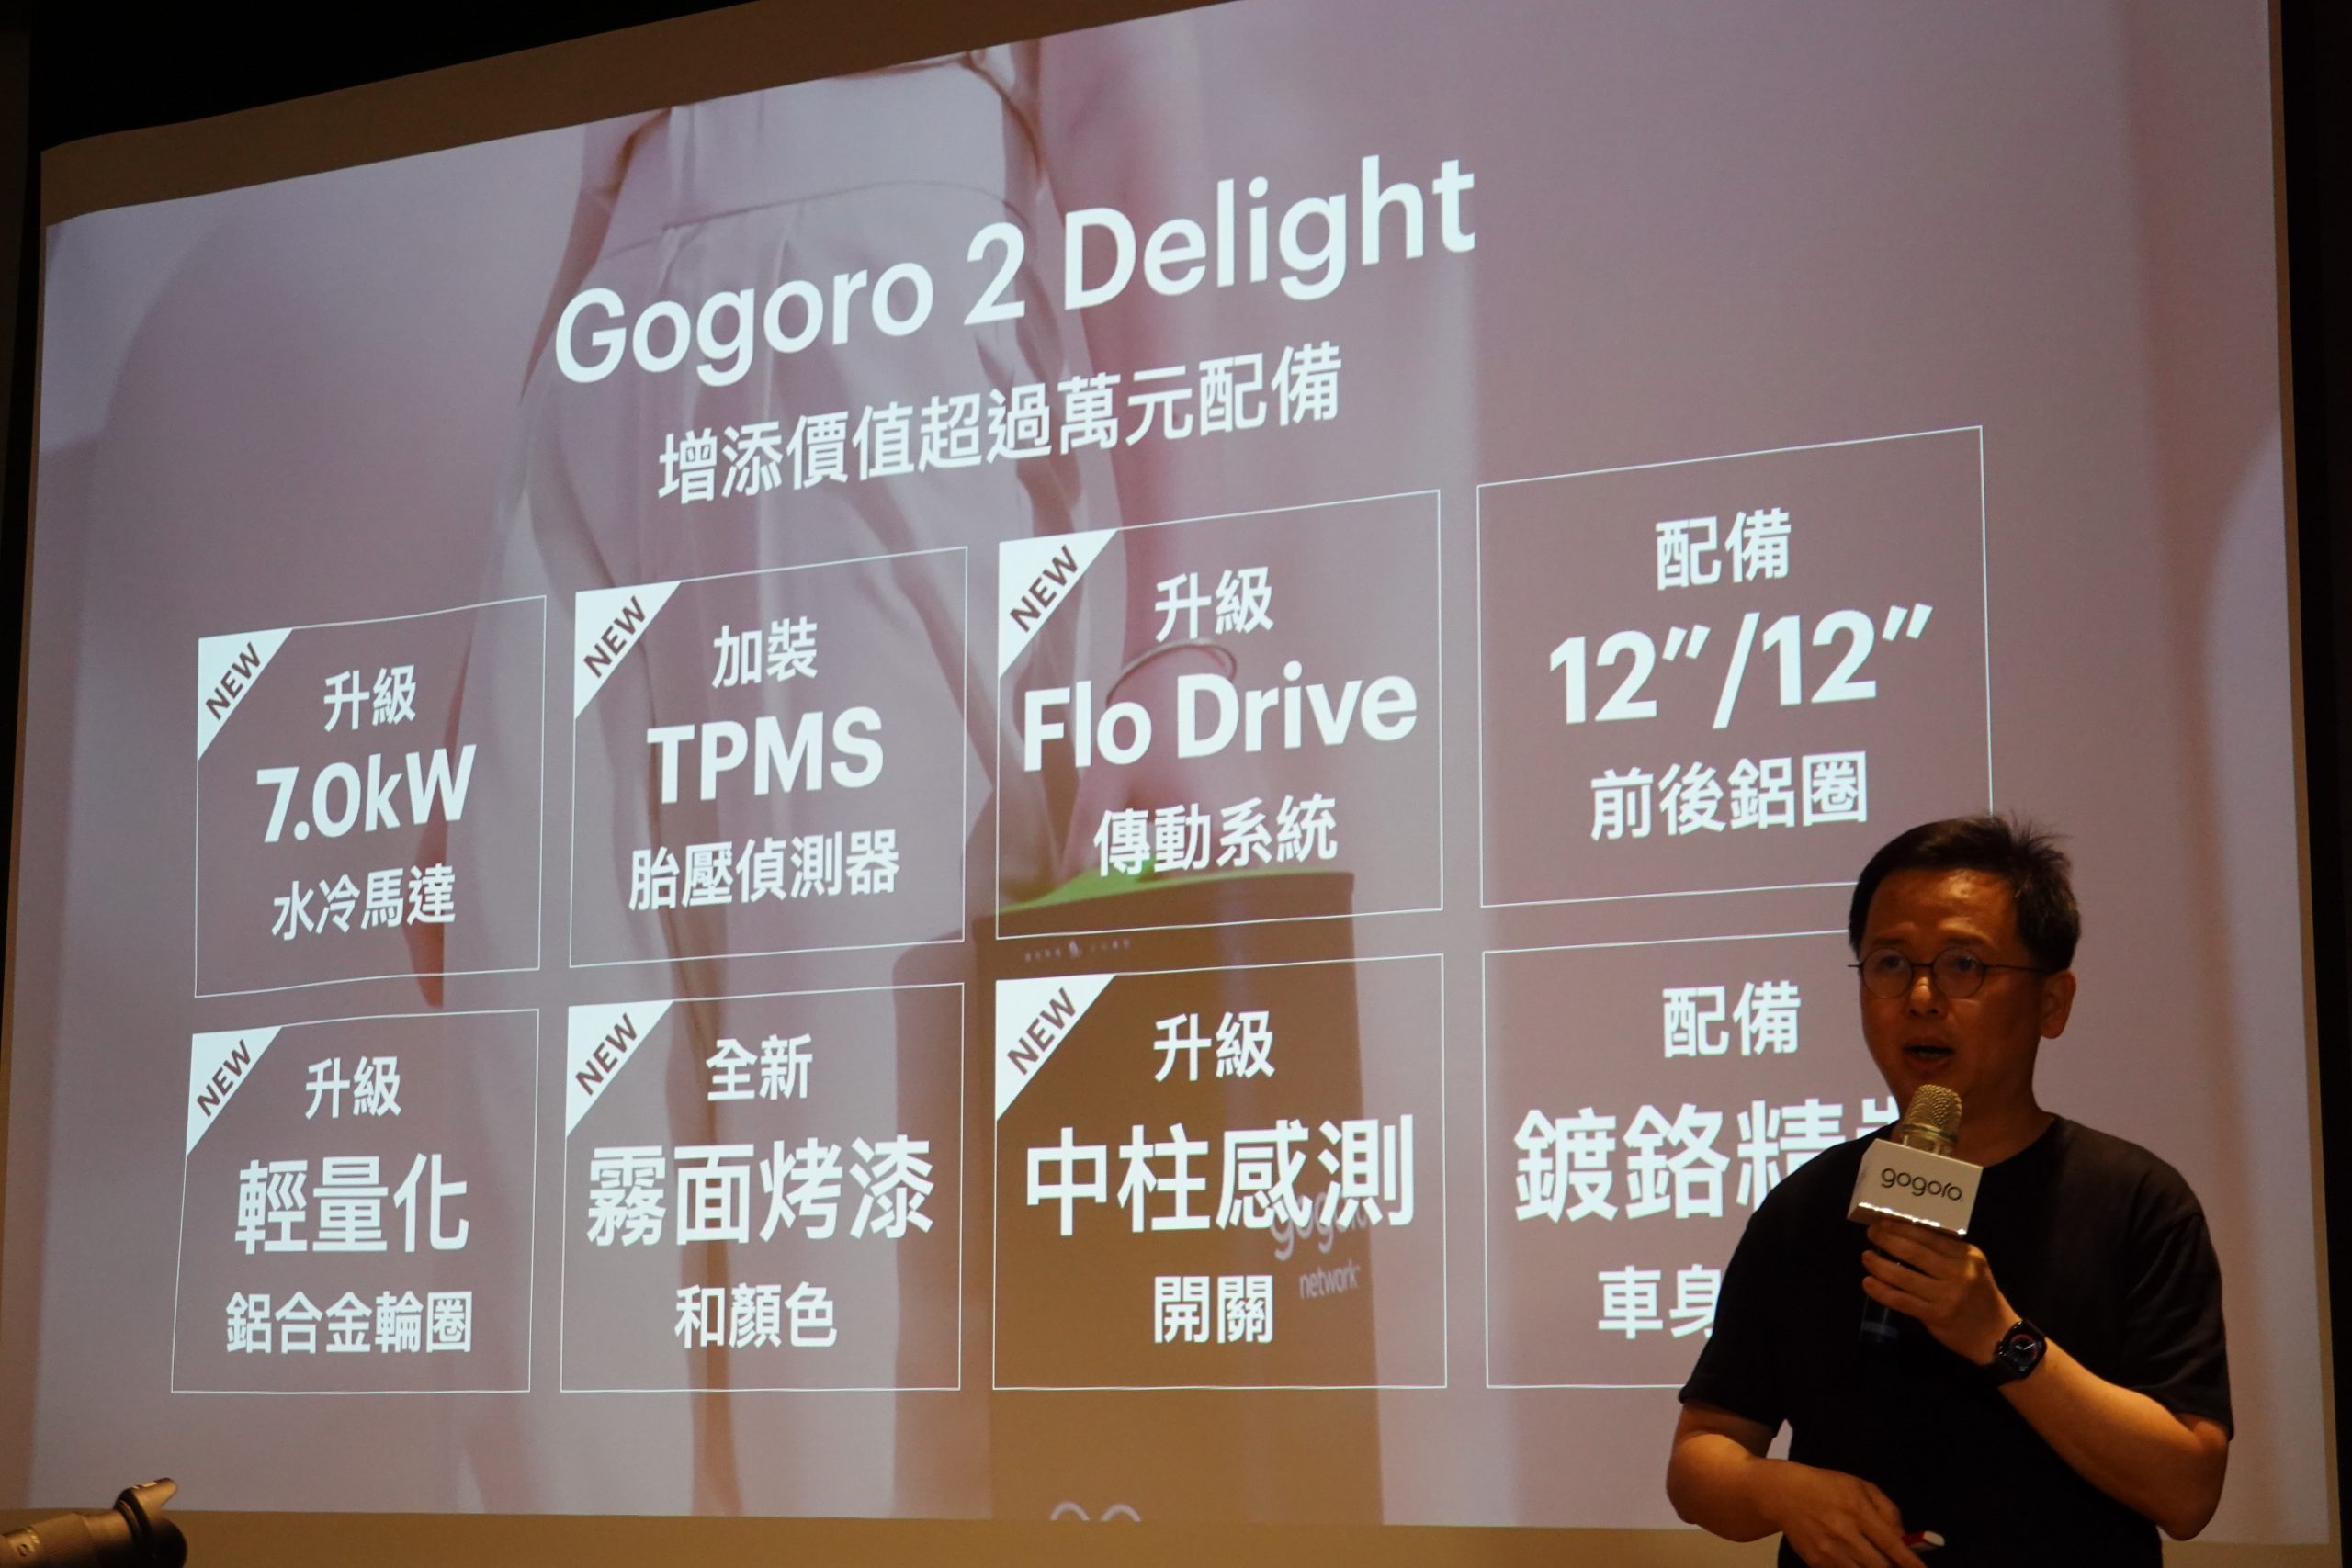 Gogoro 2 Delight 2021